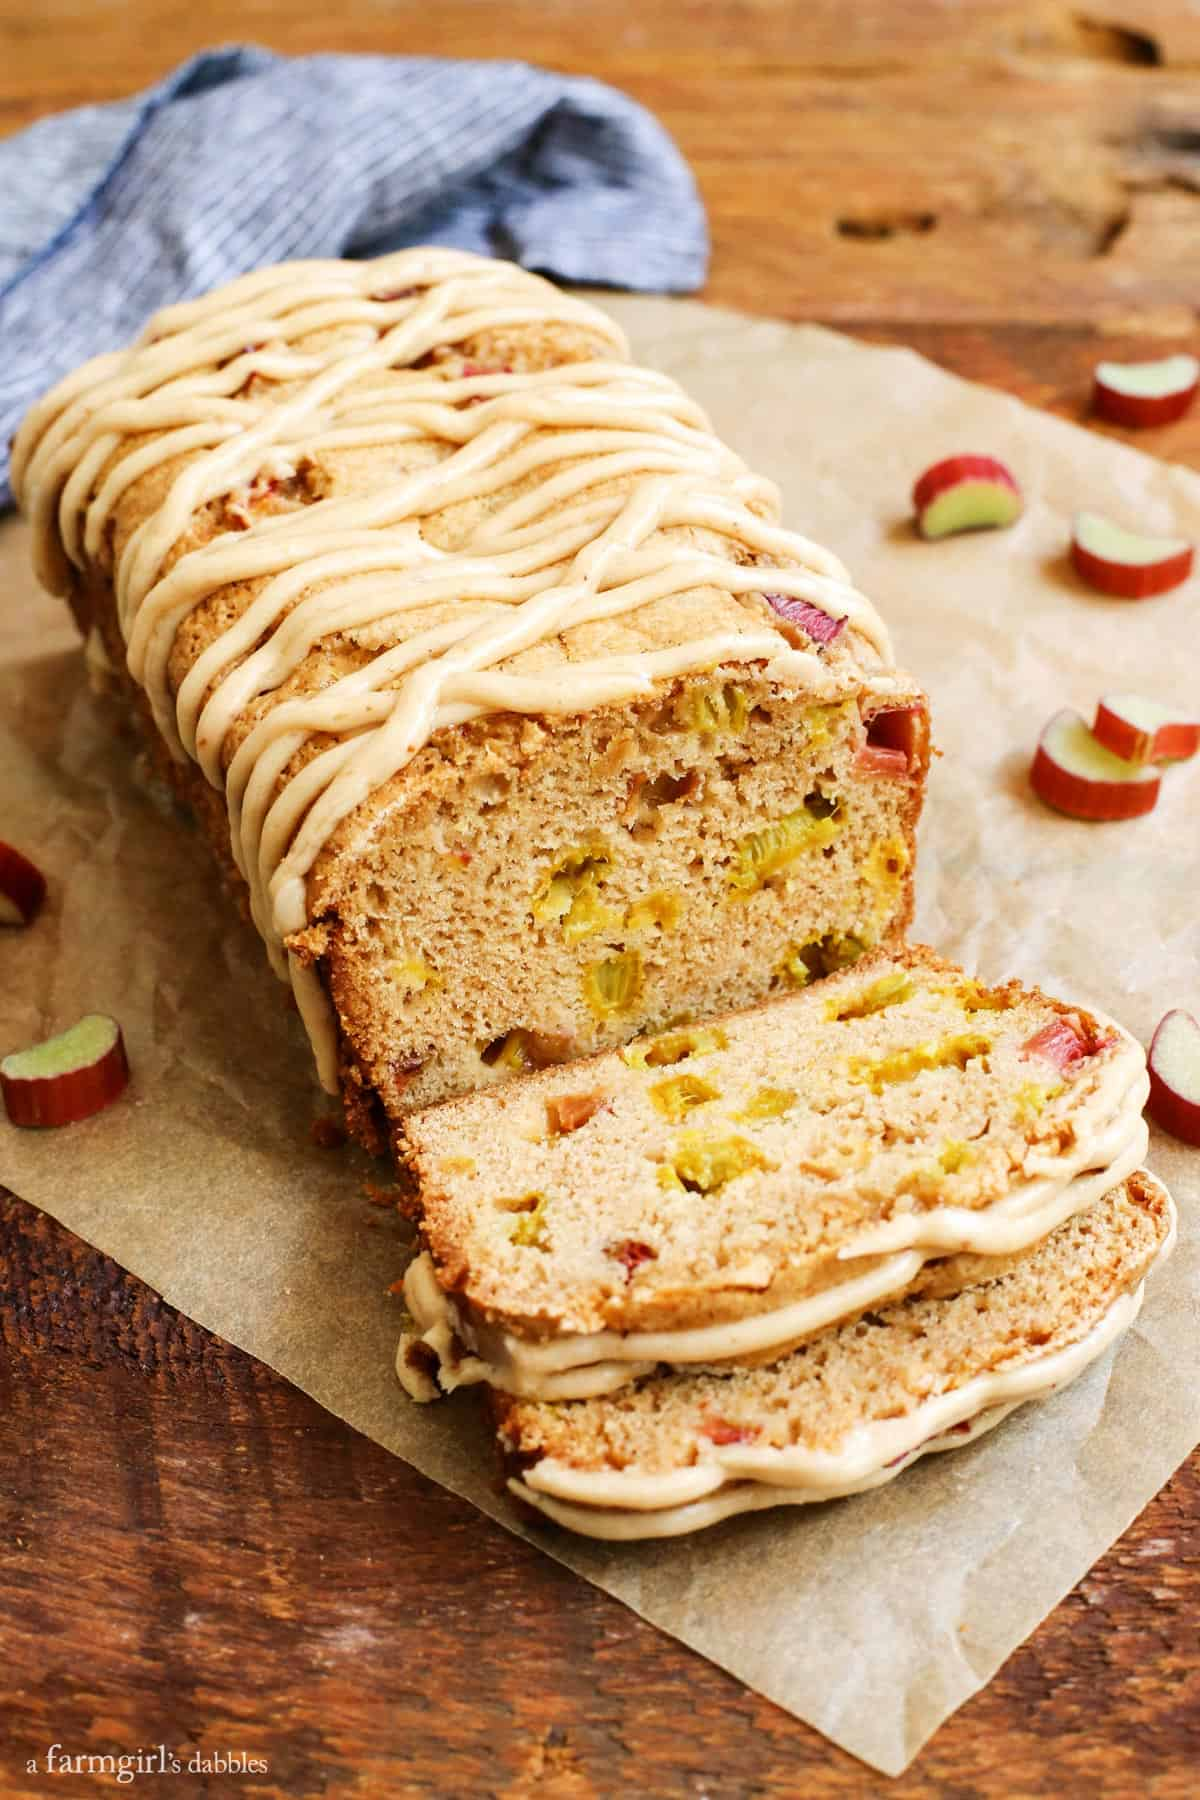 Cinnamon Rhubarb Bread with Brown-Butter Glaze from afarmgirlsdabbles.com